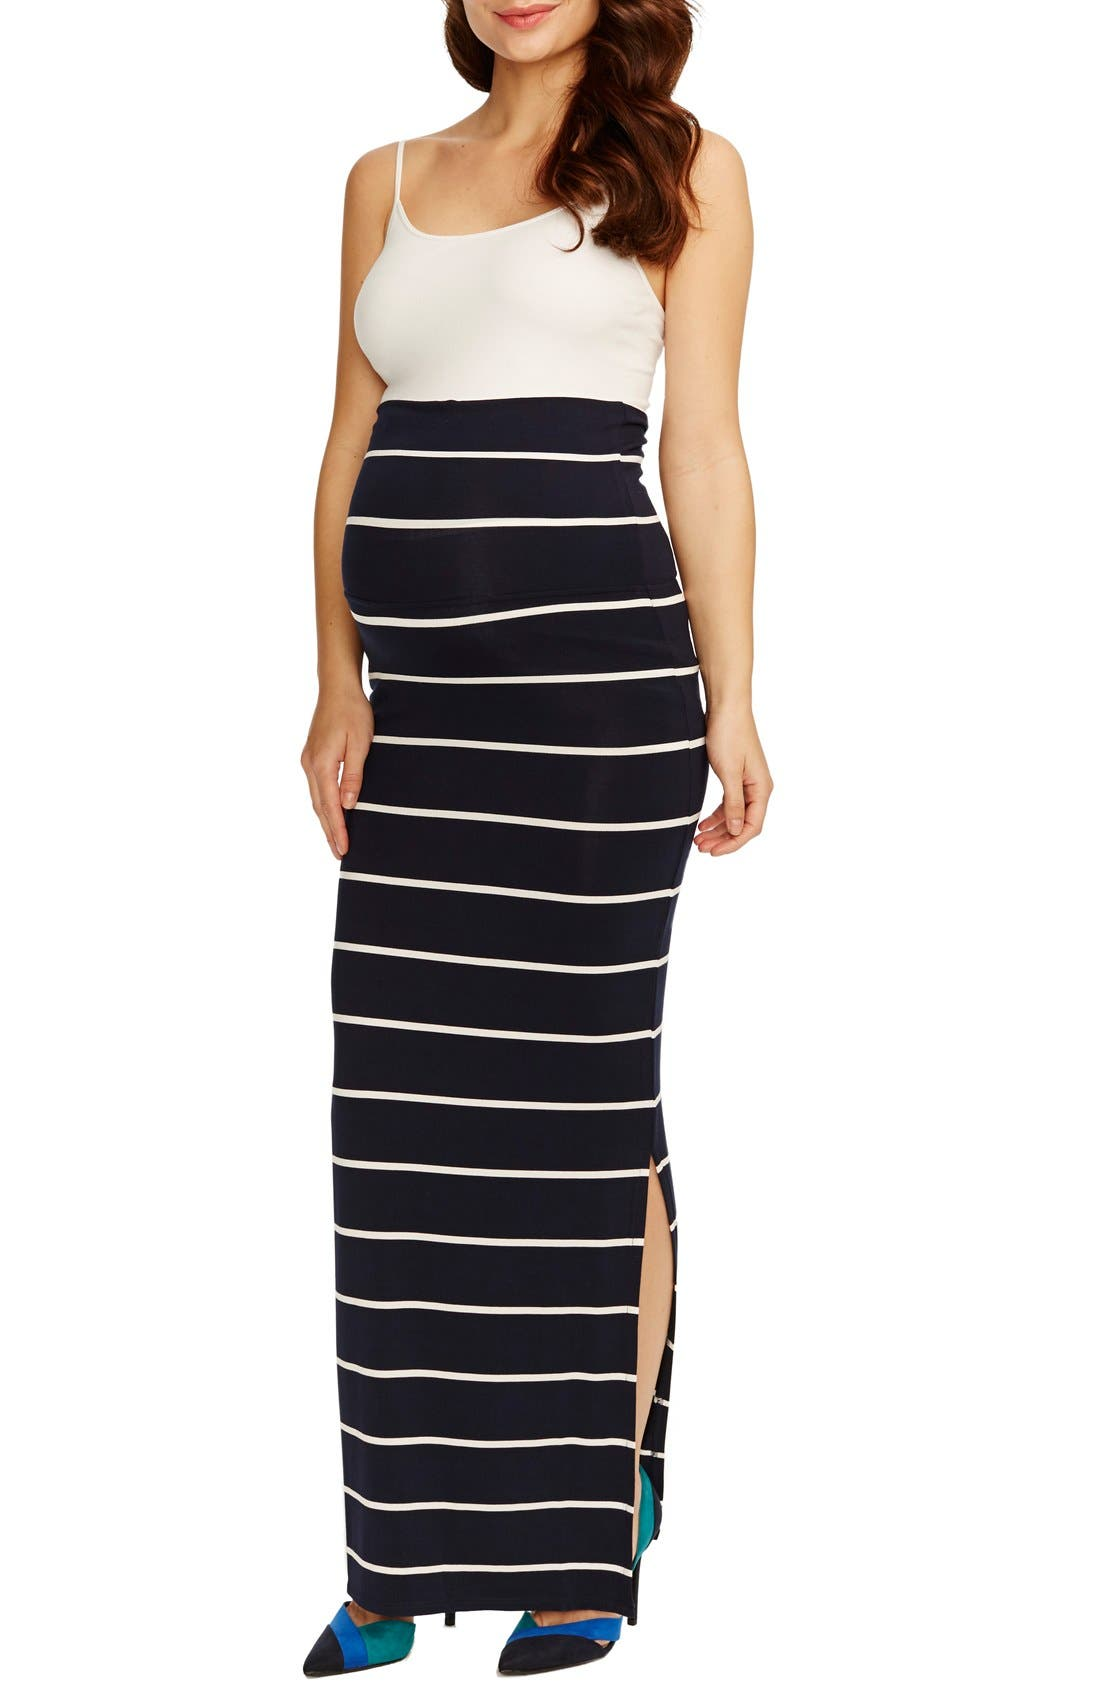 'Jessica' Stripe Maternity Maxi Skirt,                         Main,                         color, NAVY WHITE STRIPE